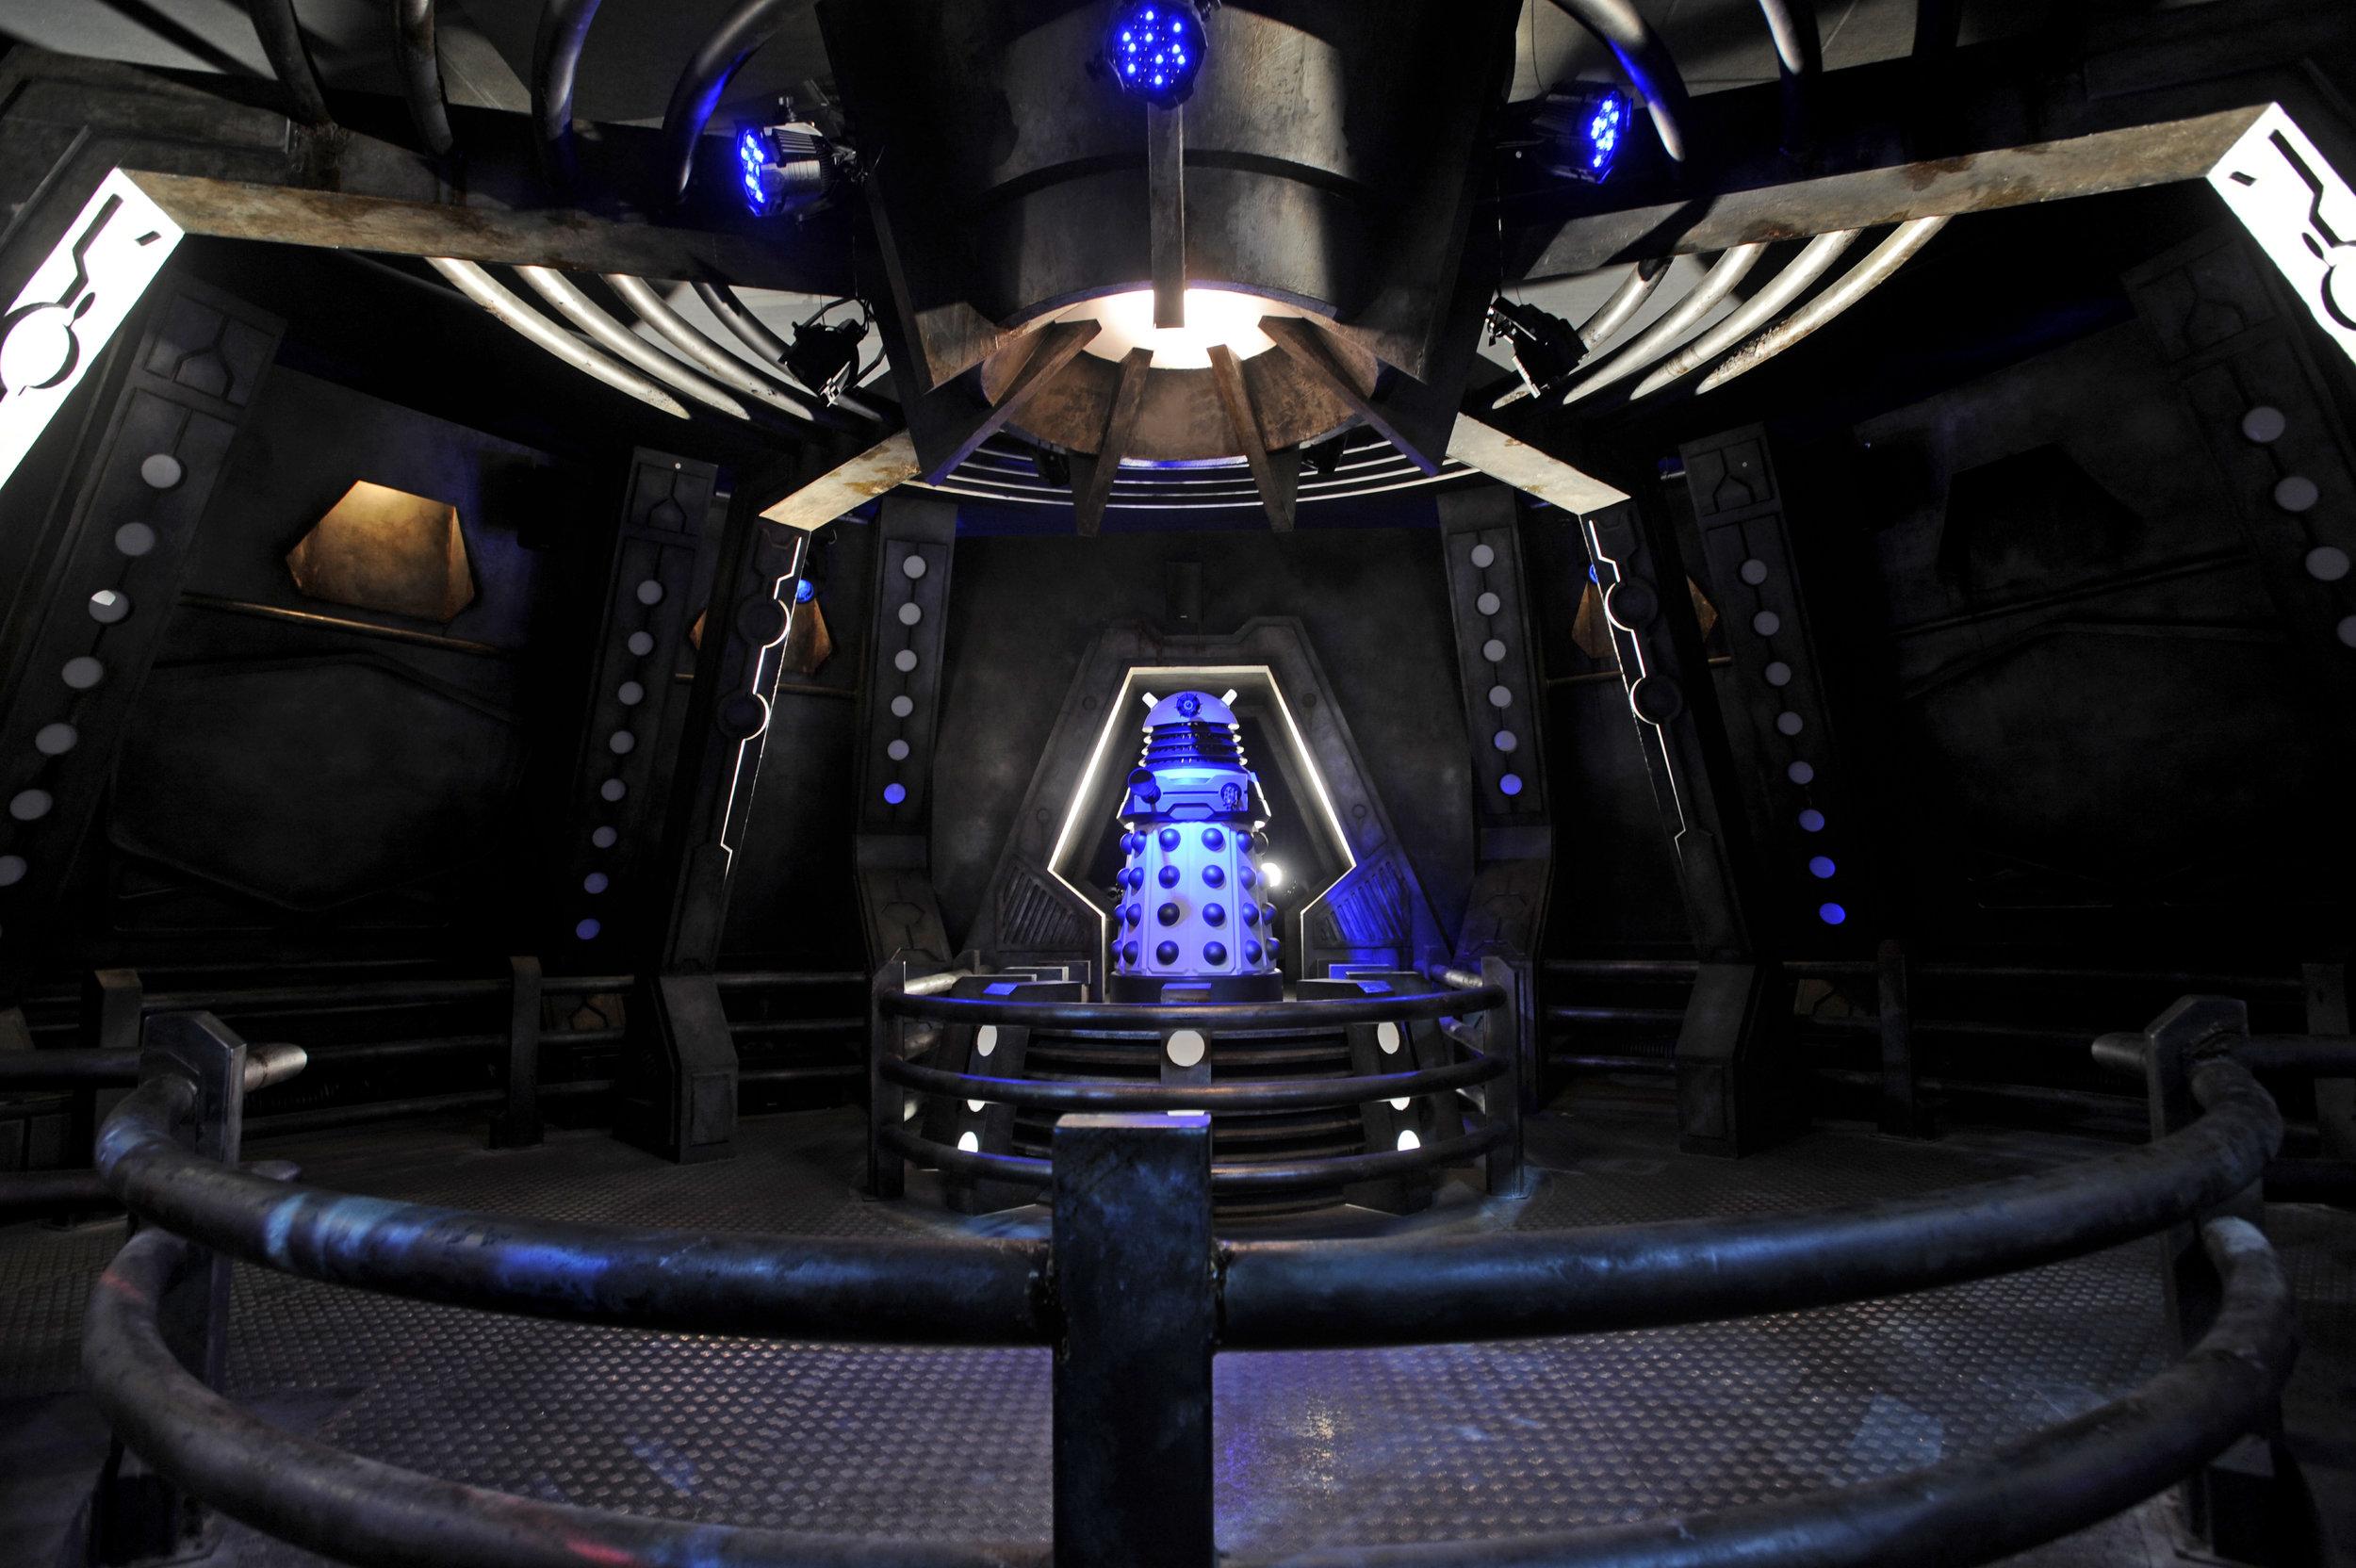 003_Dalek-Spaceship.jpg